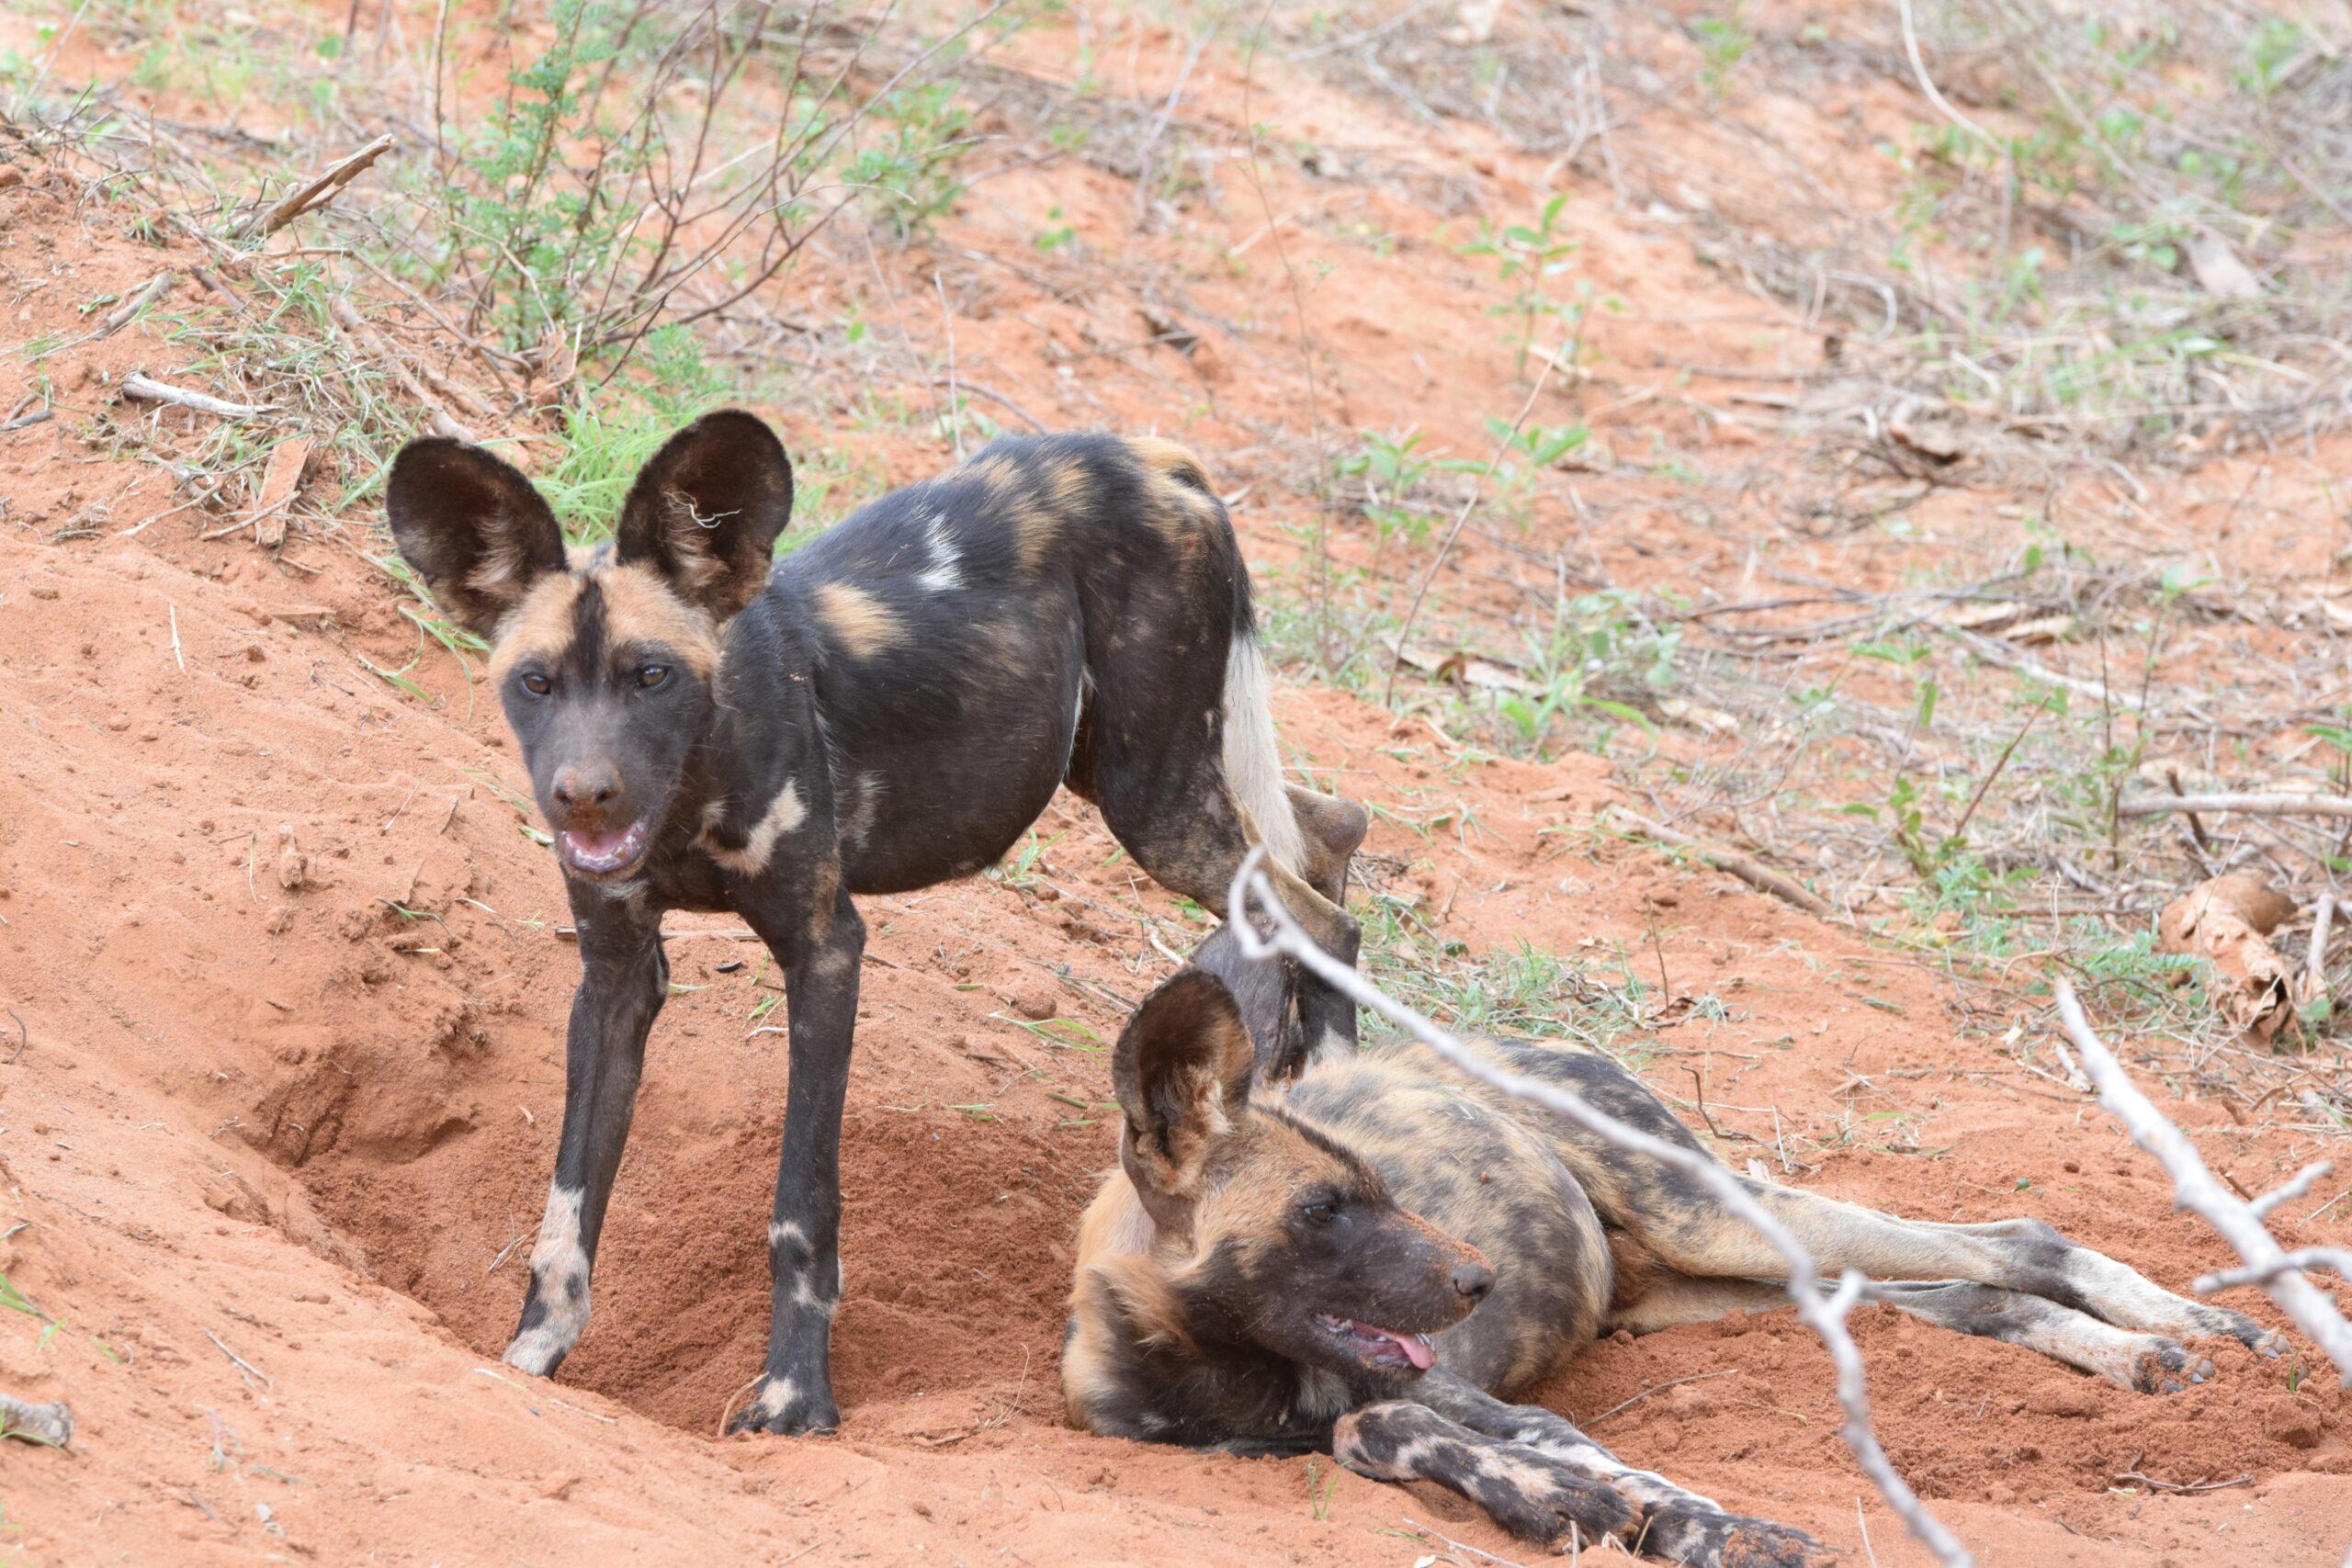 Wild dogs in Kenya